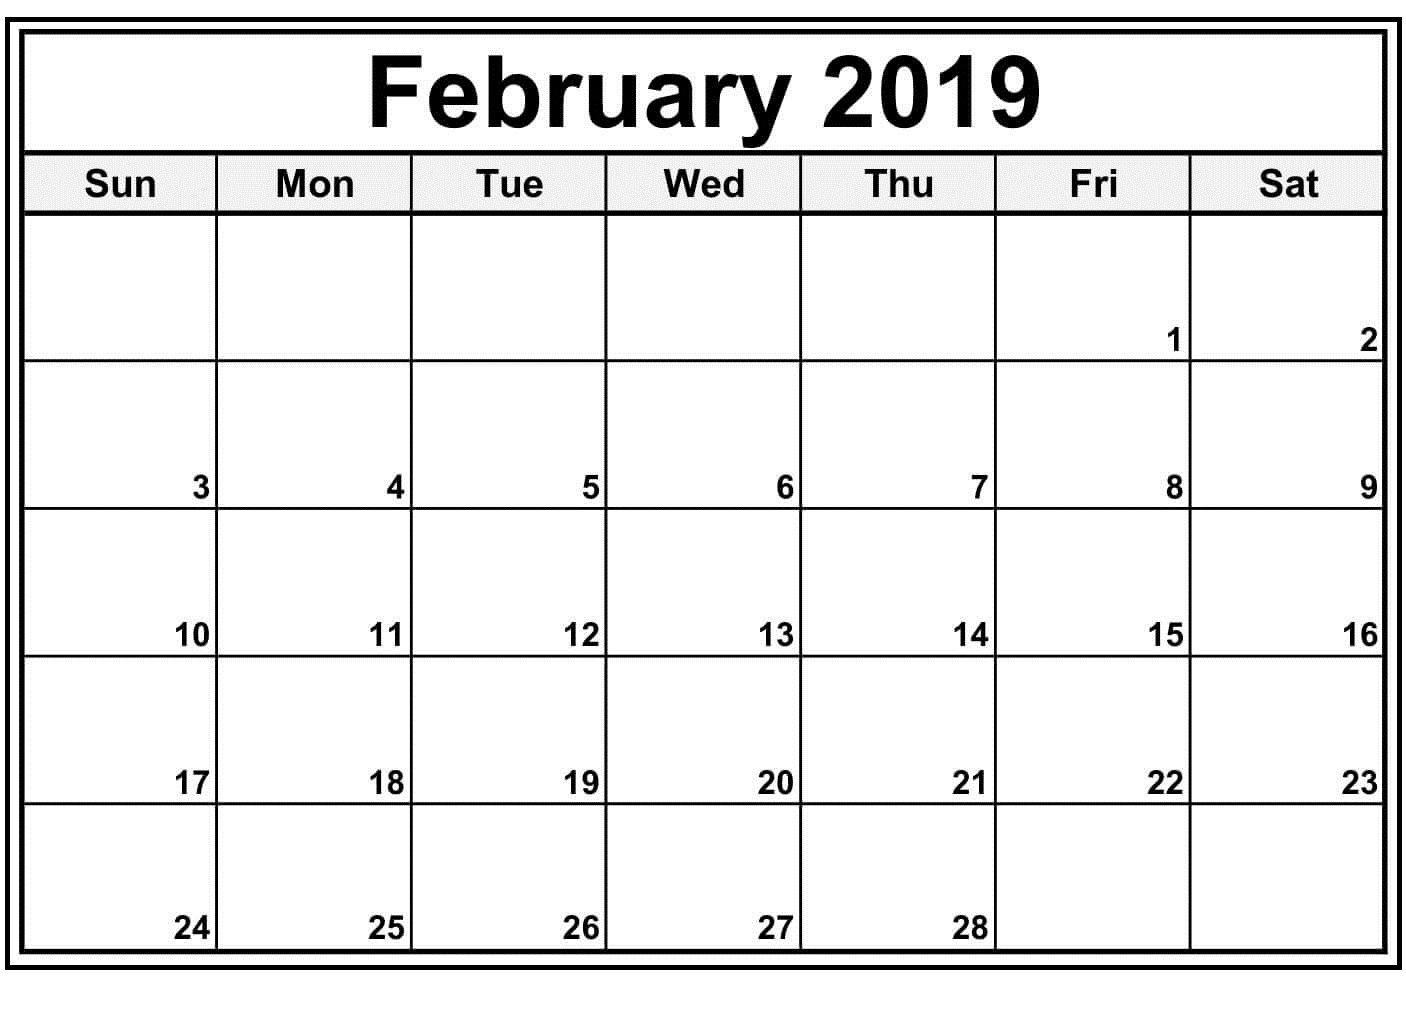 February 2019 Blank Calendar Template | February 2019 Calendar with Free Printable Blank Calendar Templates